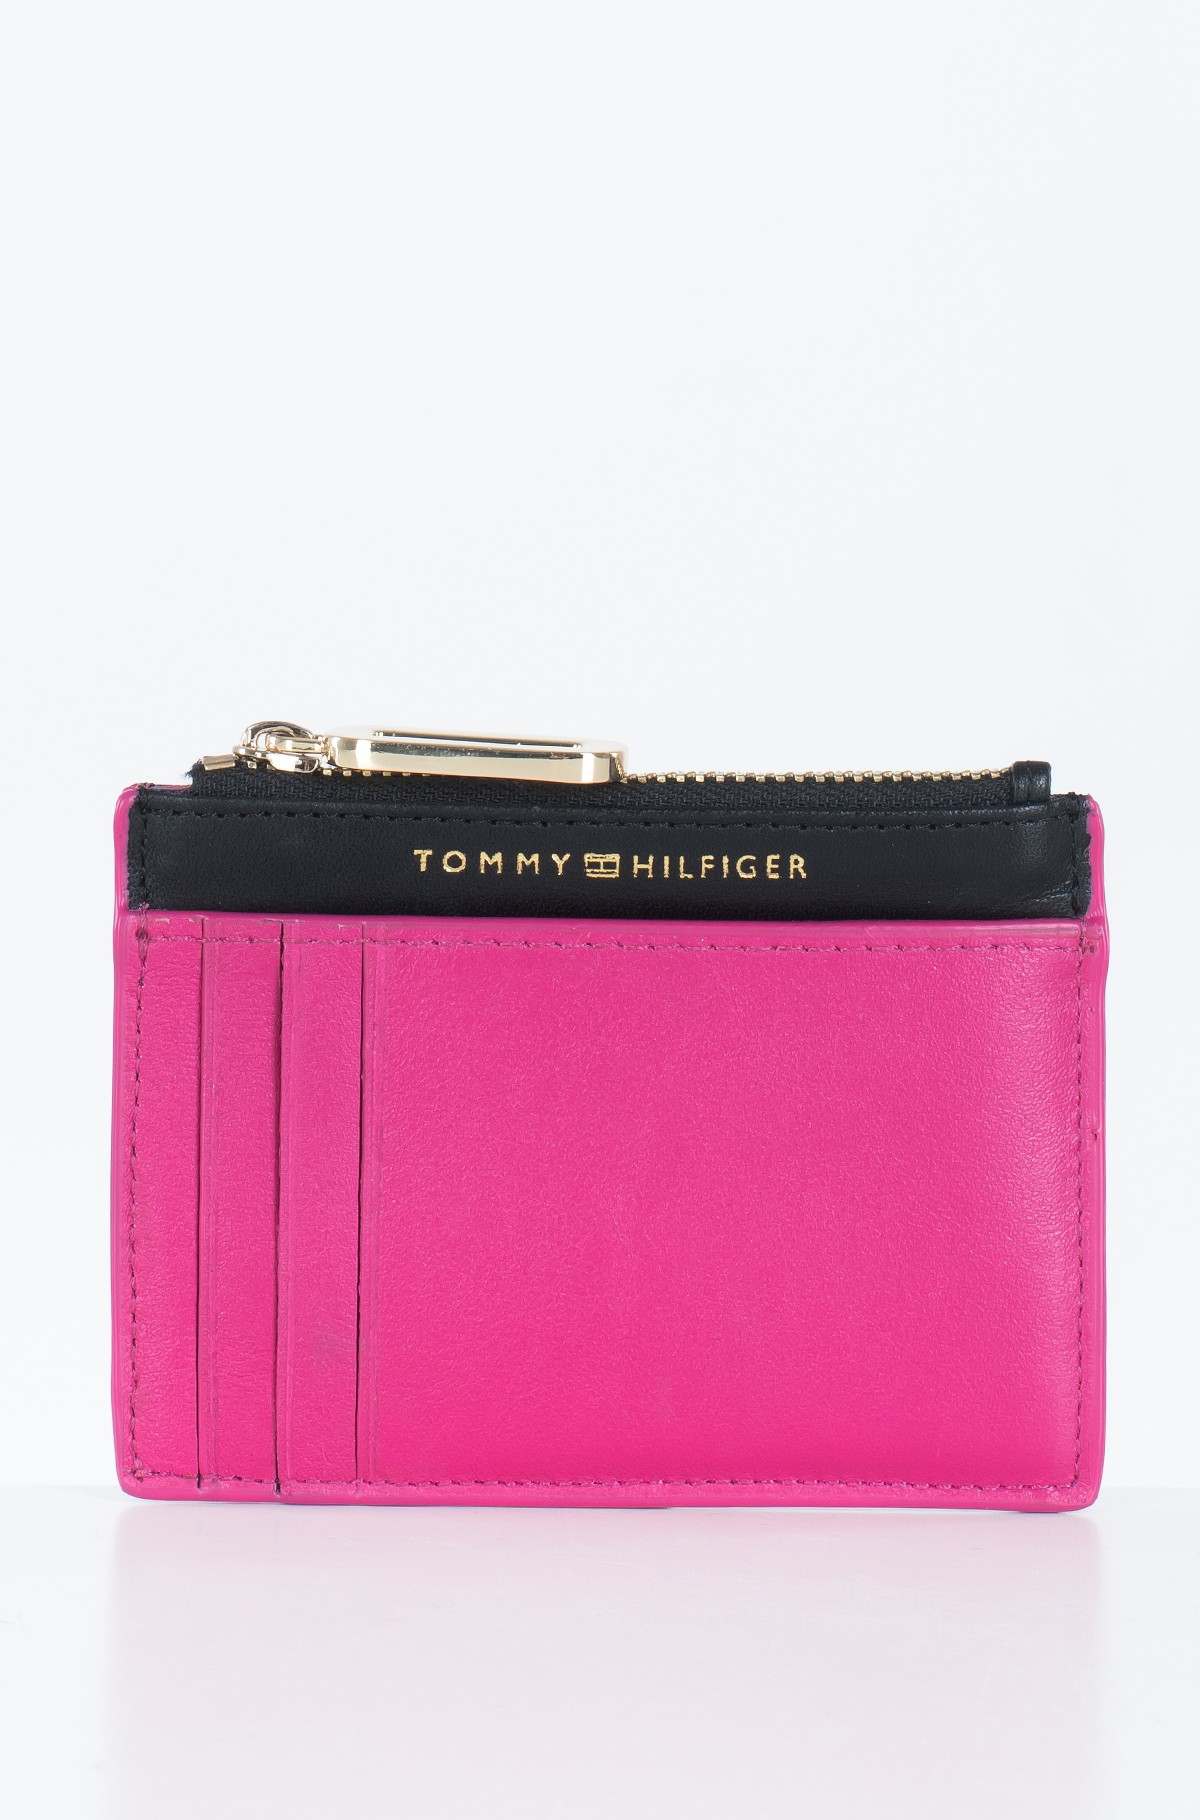 Card pocket SOFT TURNLOCK CC HOLDER-full-1